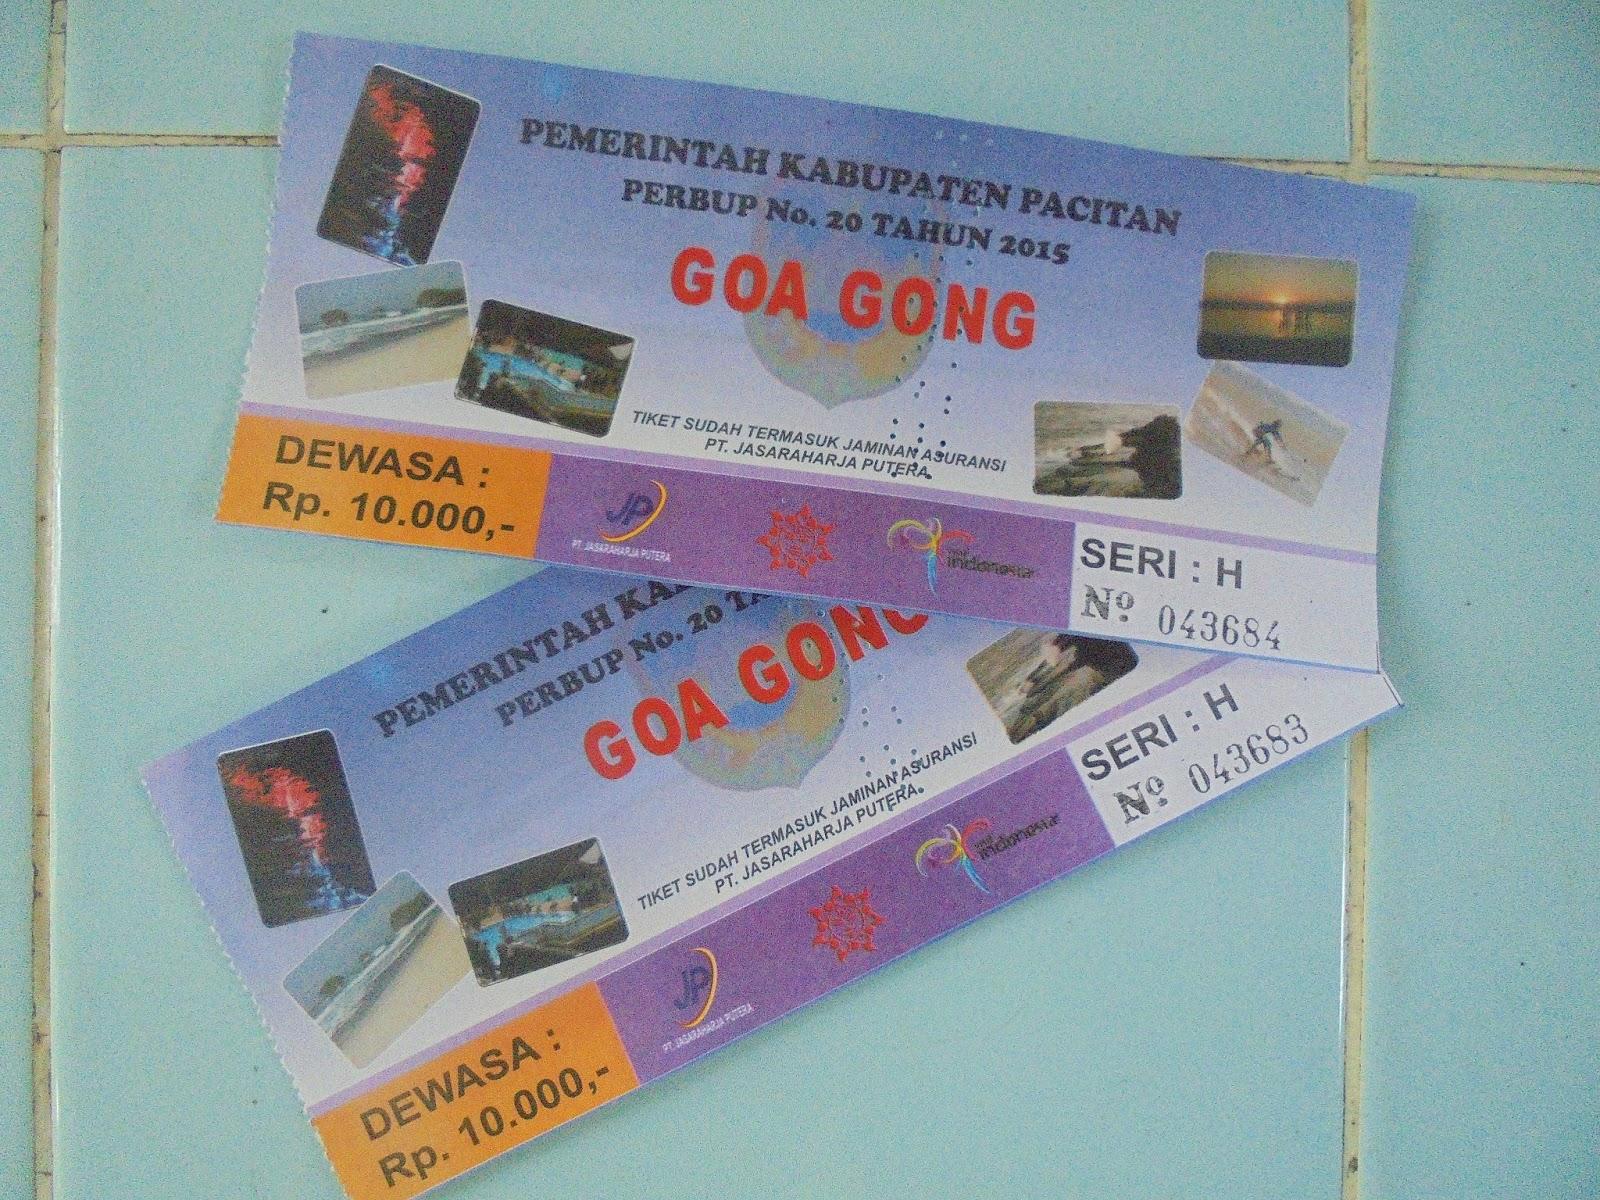 My Trip To Goa Gong Pacitan Rahman Kamal